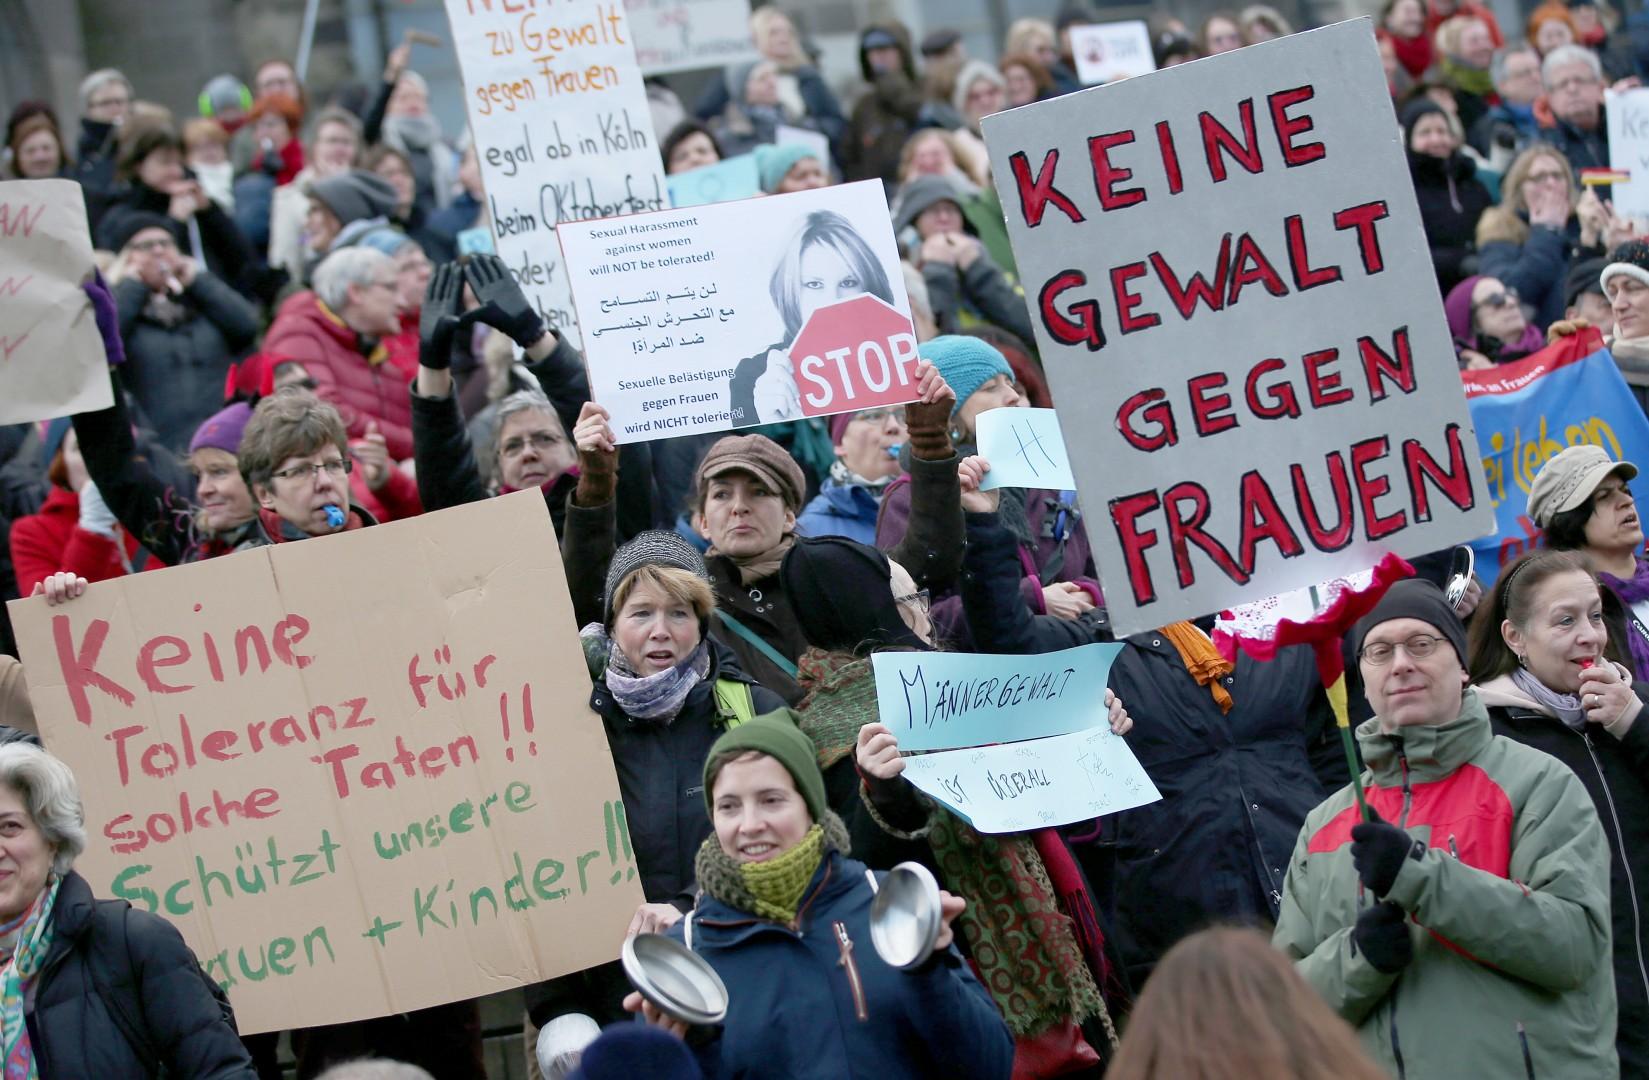 Protesti po napadih v Kölnu (foto: epa)